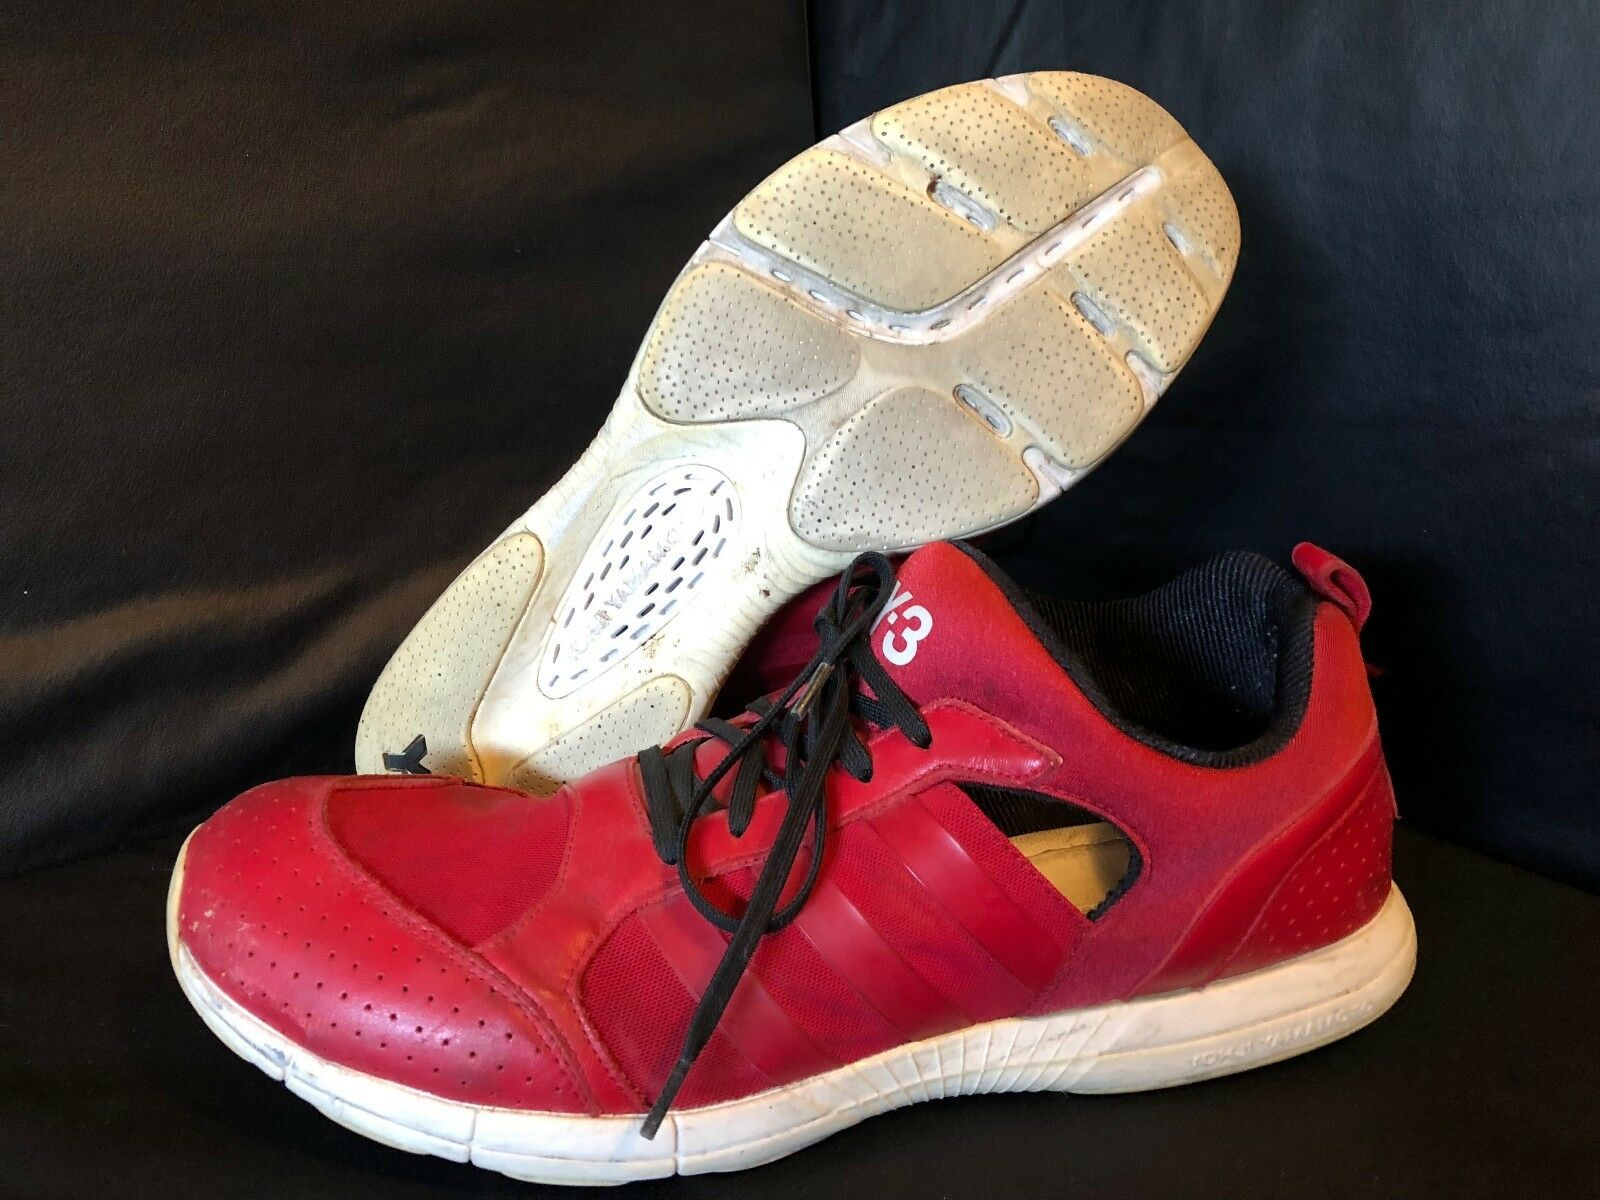 Adidas Y-3 Size 11.5 Red Y3 YOHJI YAMAMOTO with Free Shipping